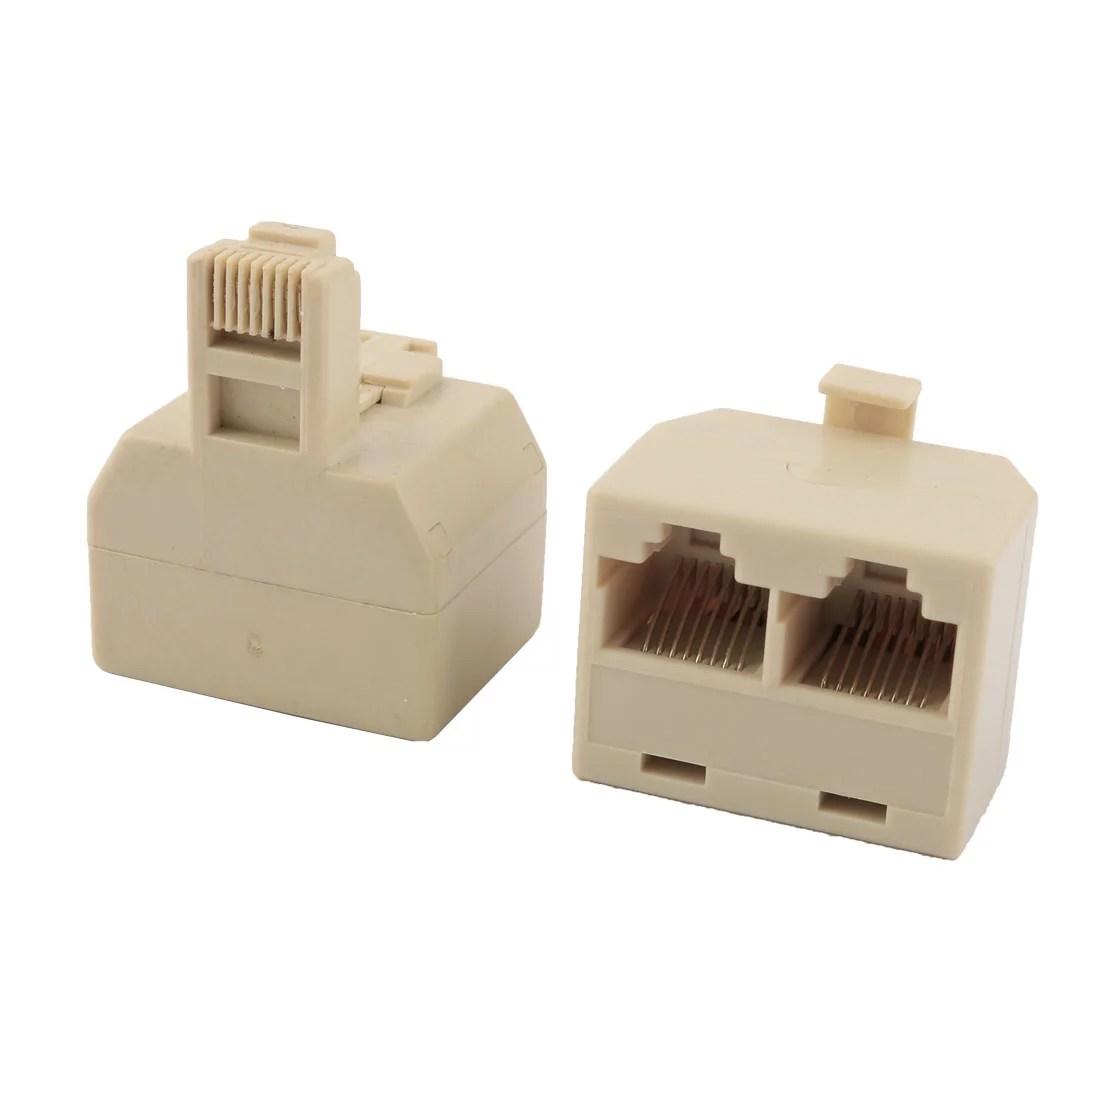 medium resolution of rj45 8p8c keystone 1 male to 2 female port network cable splitter beige 2pcs